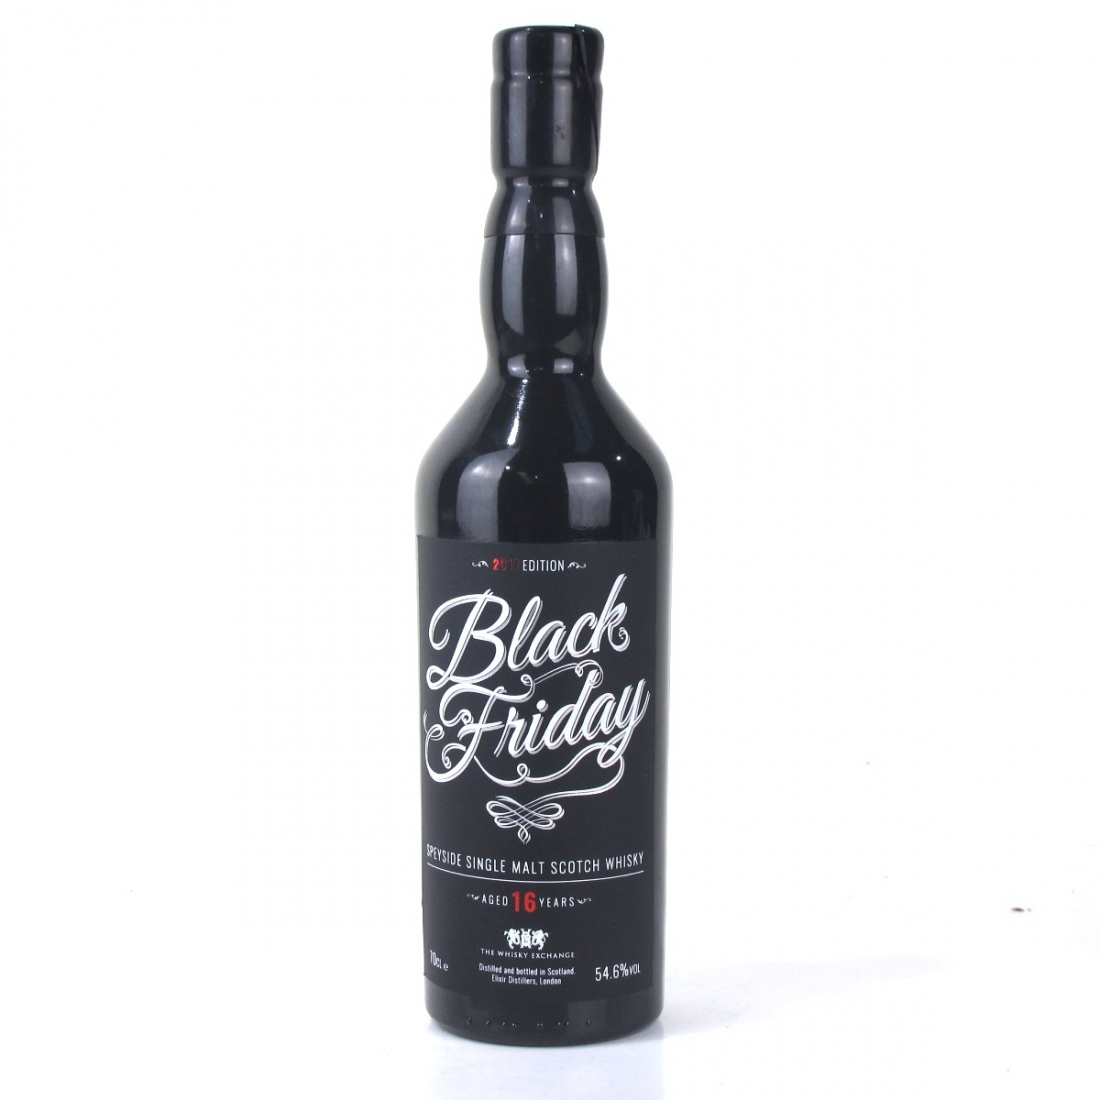 Black Friday Elixir 16 Year Old Speyside Single Malt